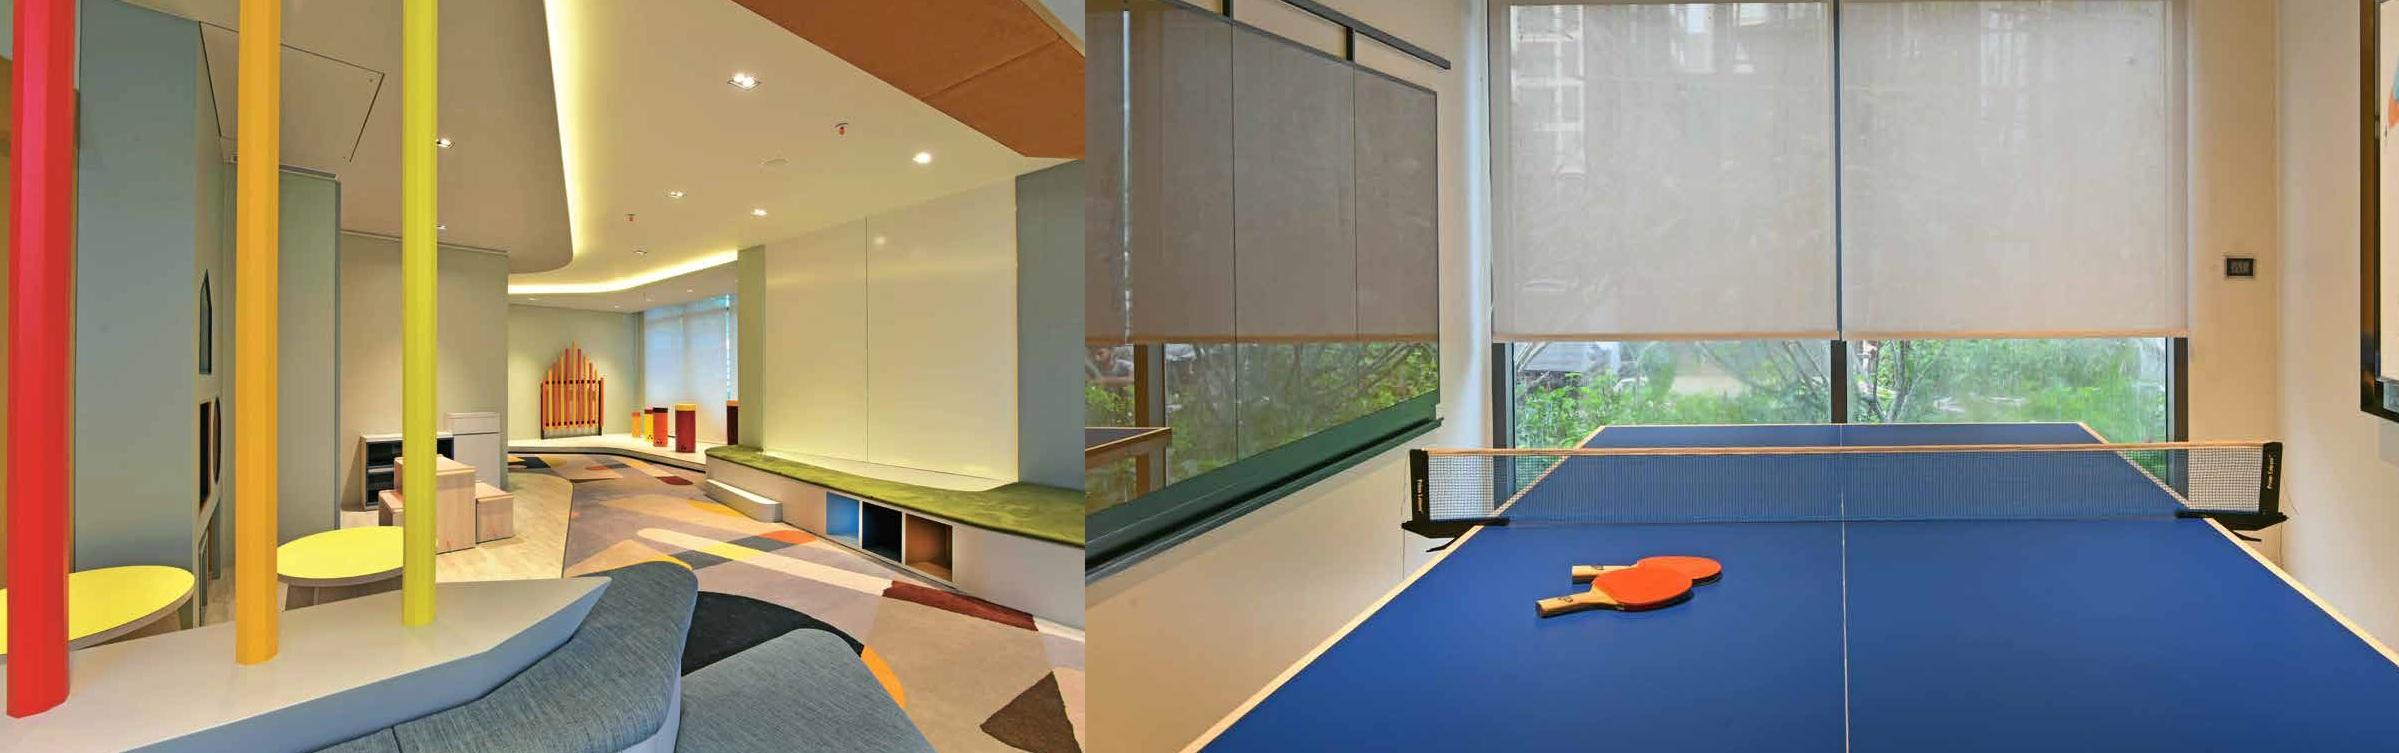 rustomjee seasons apartment interiors8